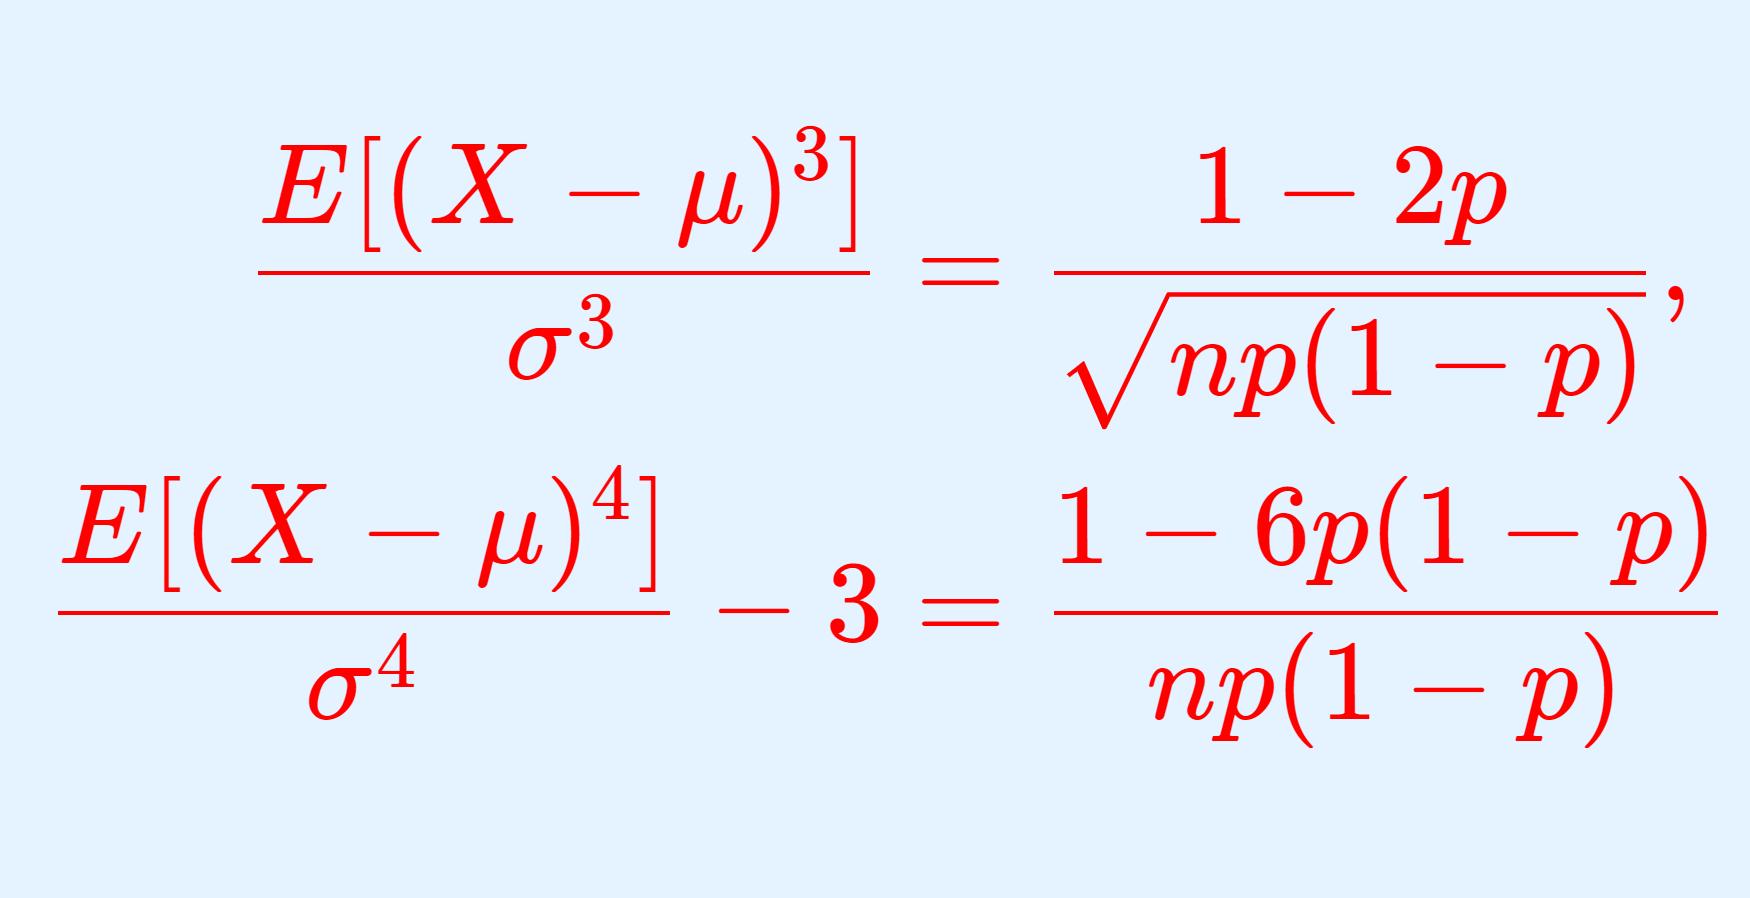 二項分布の歪度・尖度